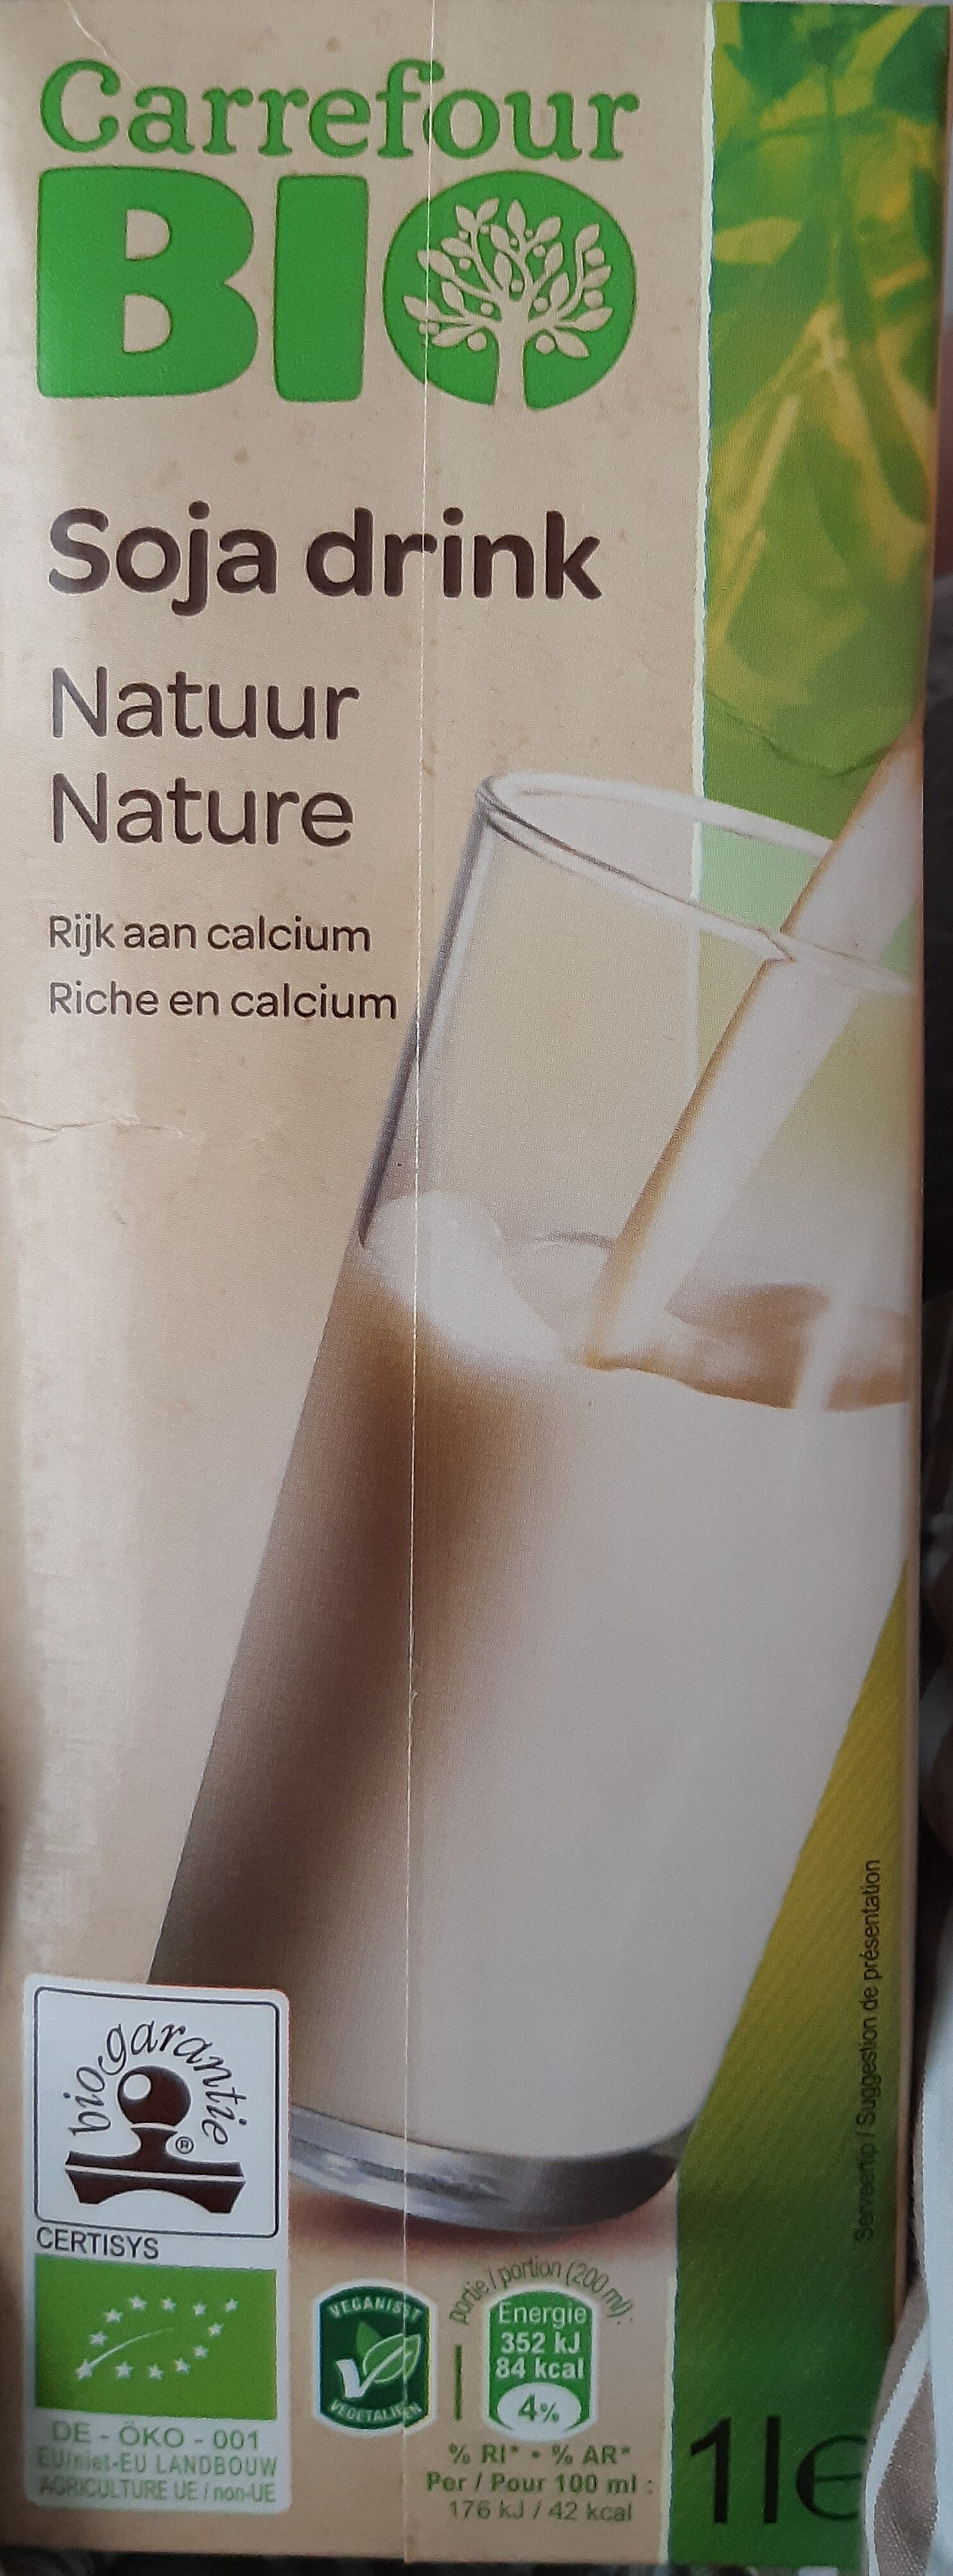 Soja drink nature Bio - Product - fr